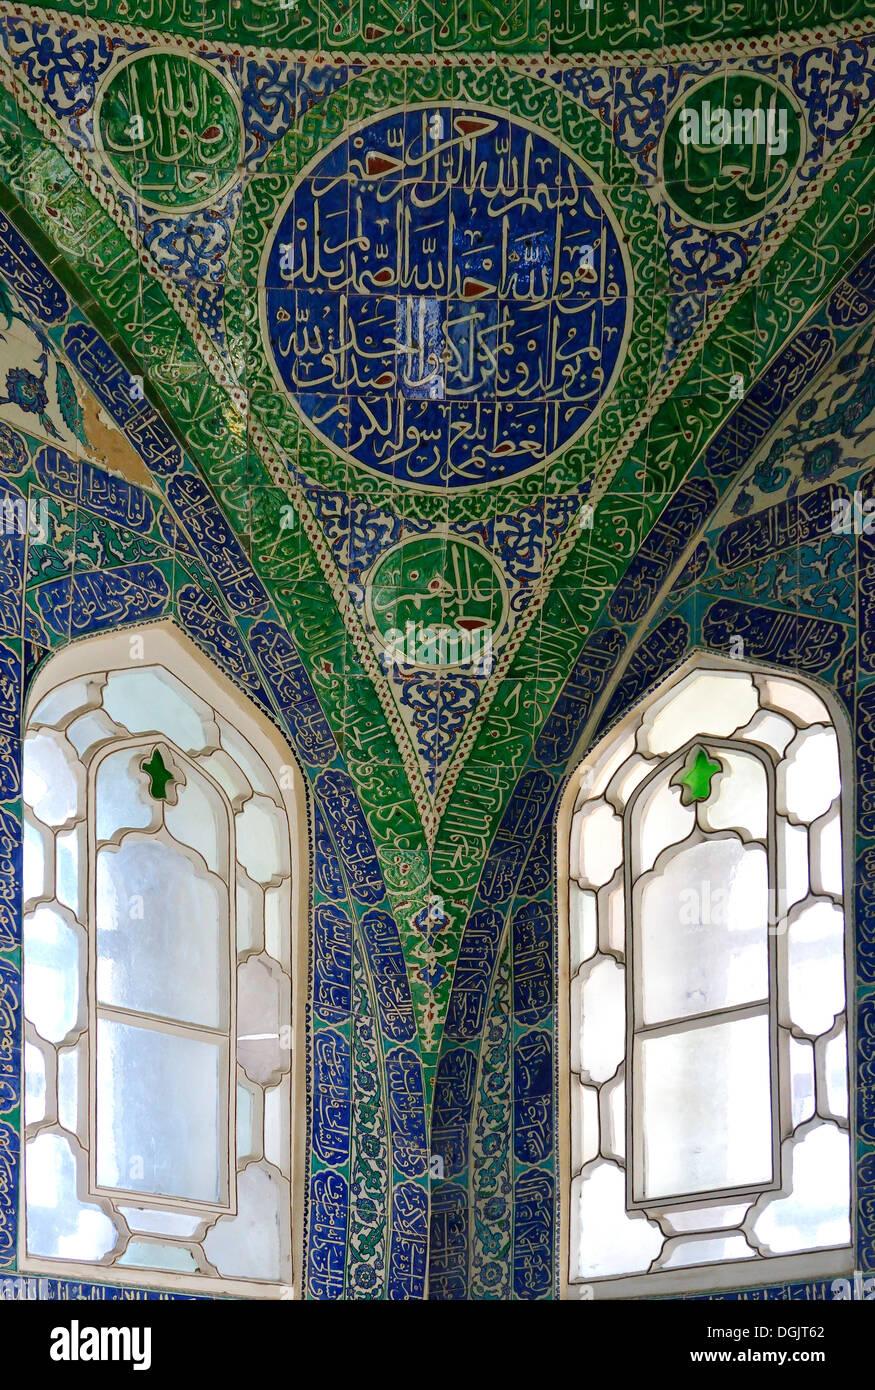 Wall tiles with Arabic characters, harem, Topkapi Palace, Topkapi Sarayi, Istanbul, European side, Istanbul Province, Turkey - Stock Image